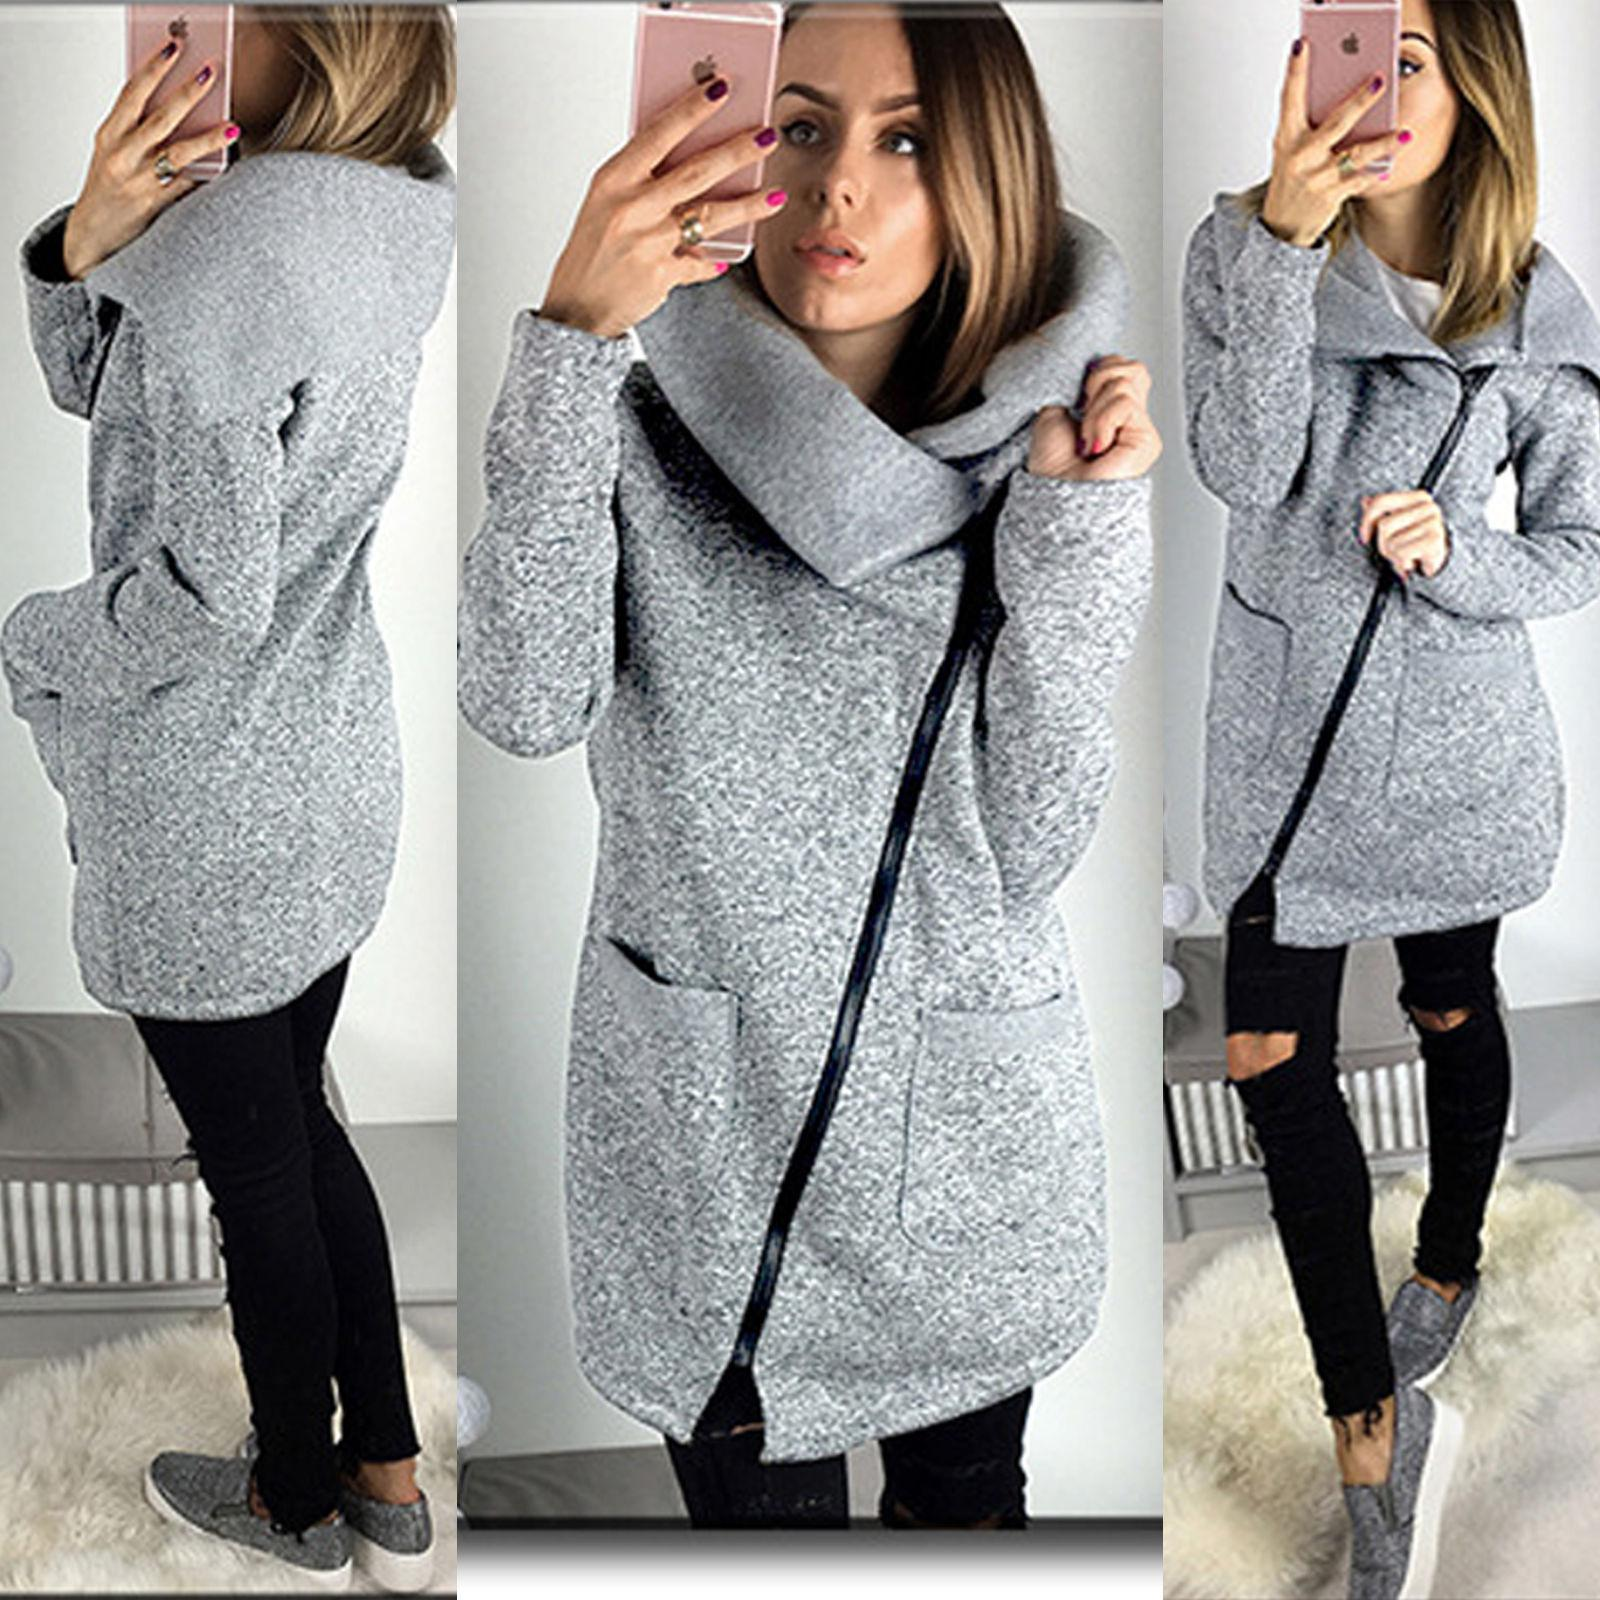 Womens Warm Casual Hoodie Jacket Coat Long Zip Up Sweatshirt Ladies Slim  Thin Autumn Oblique Zipper Outwear Tracksuit Tops Brown Leather Jackets  Suede ... dc42db8b4e